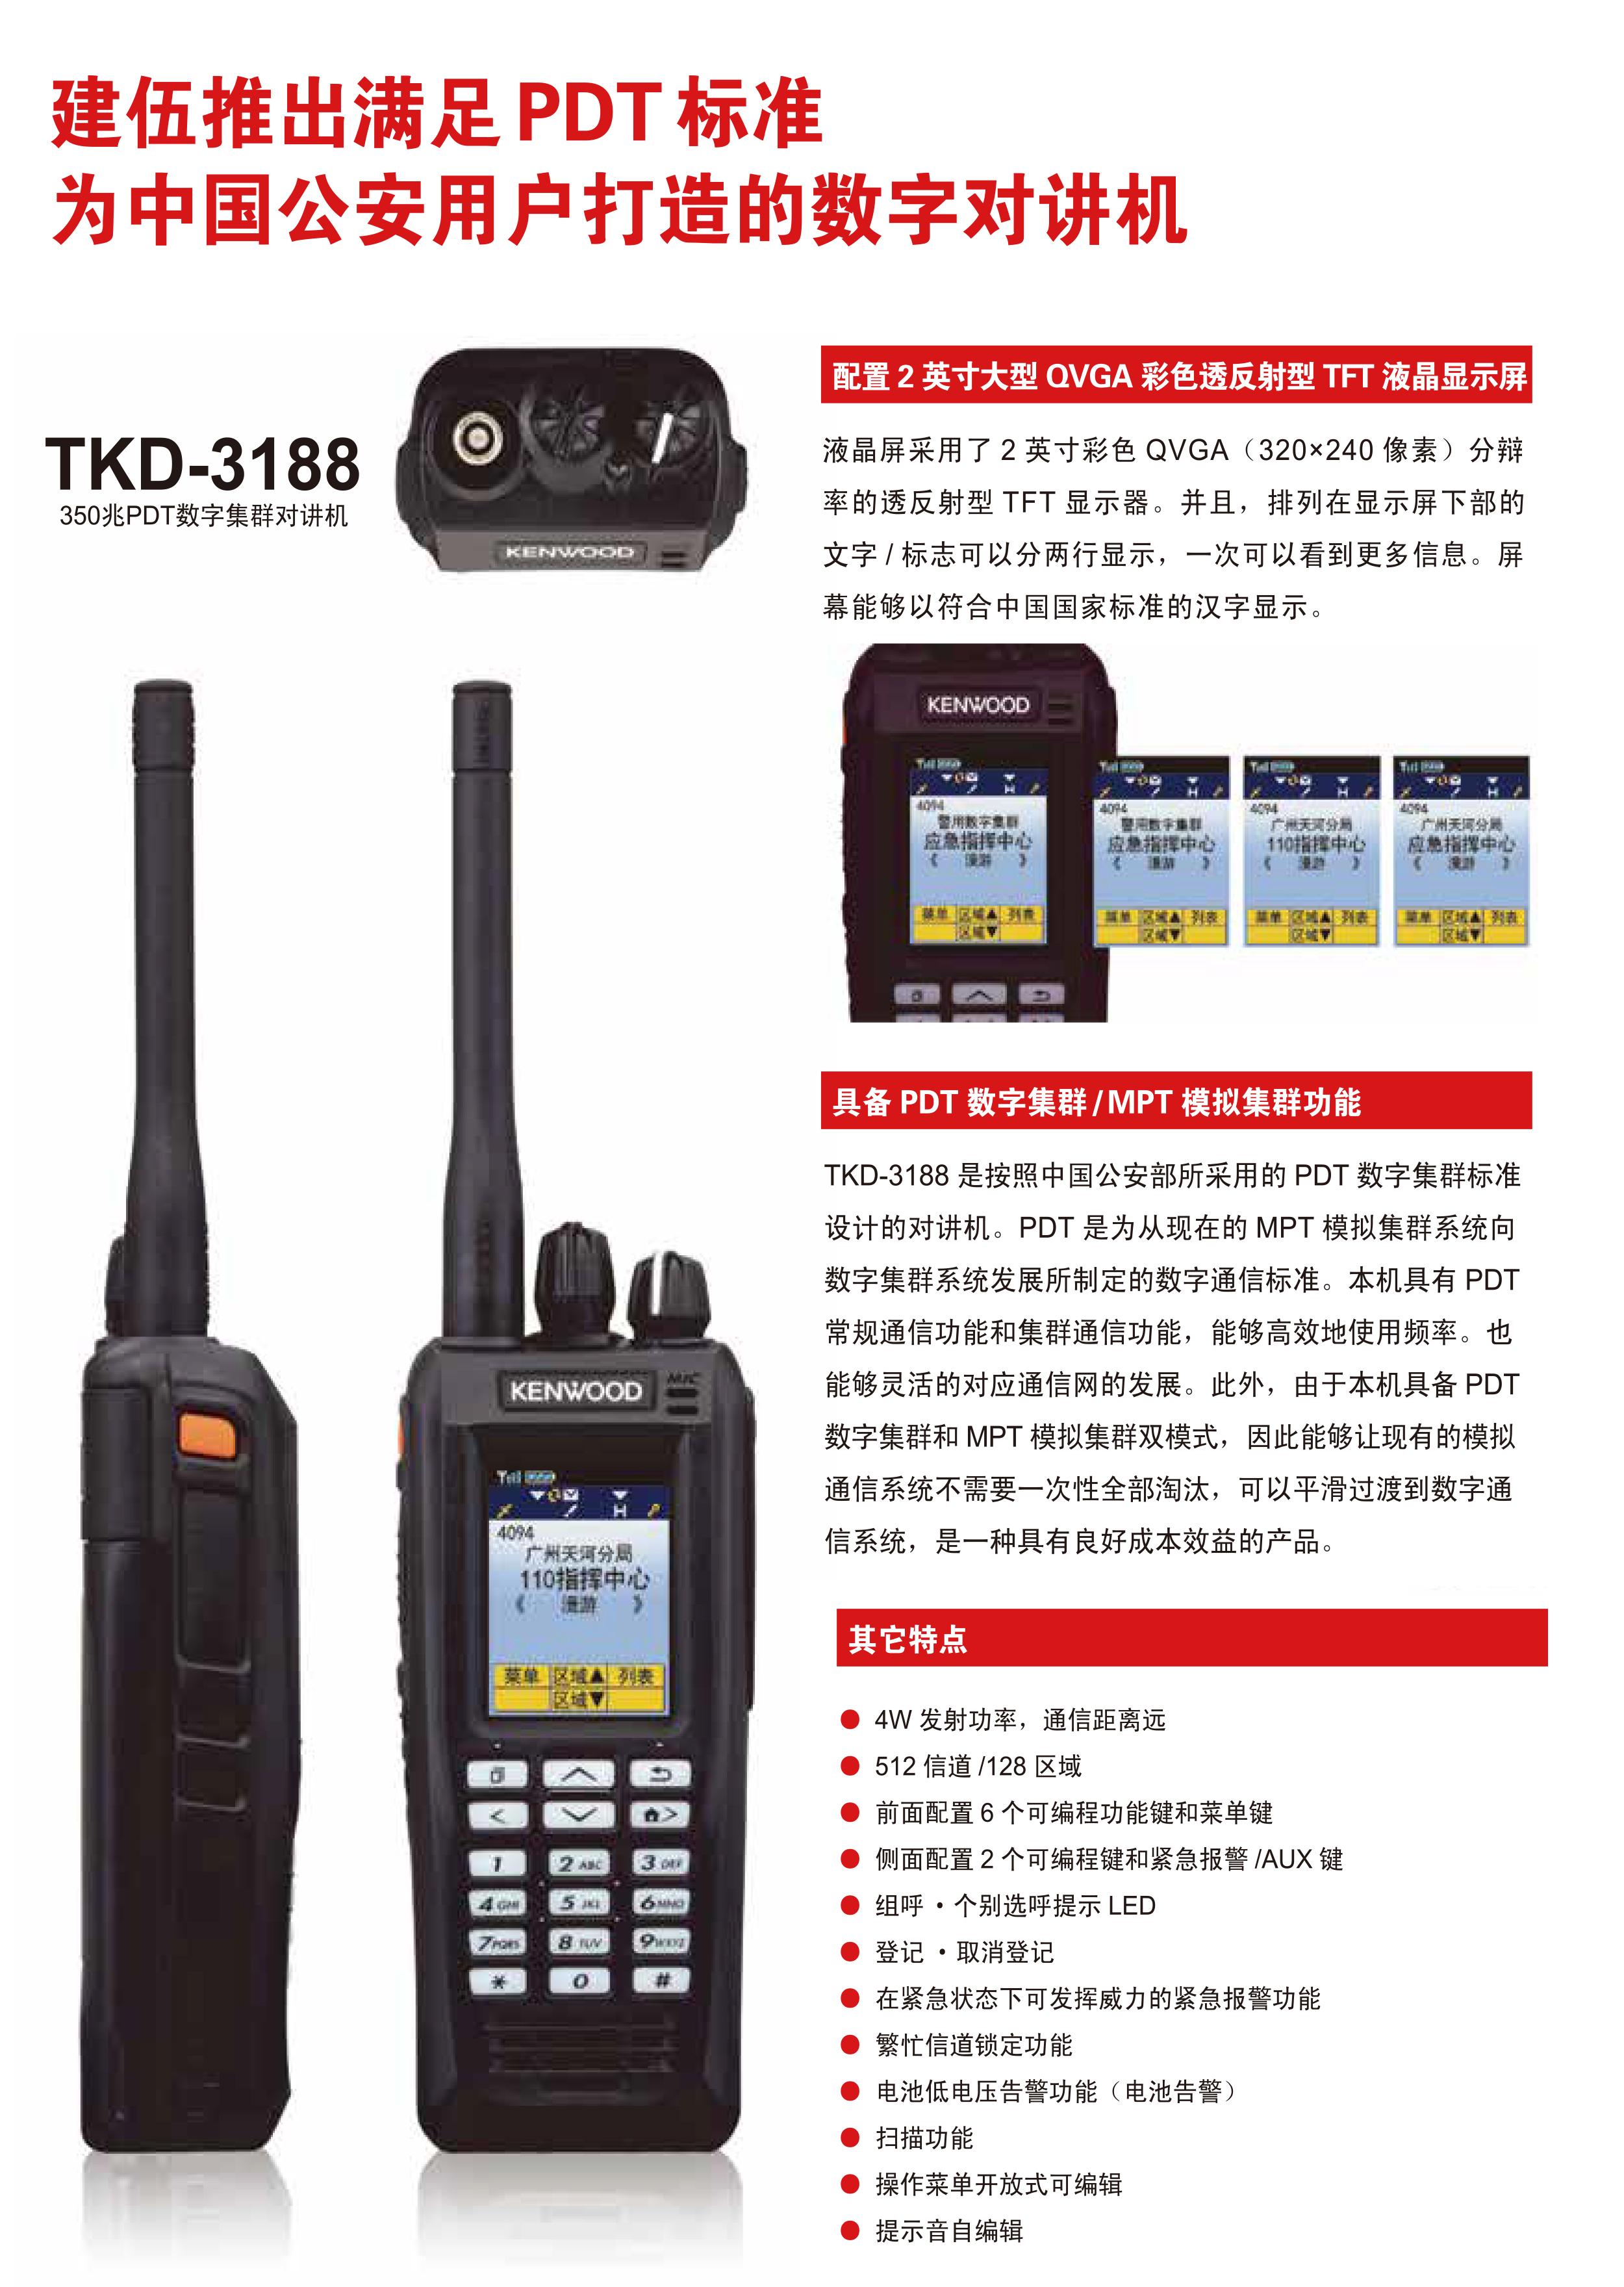 TKD-3188数字对讲机彩页_02